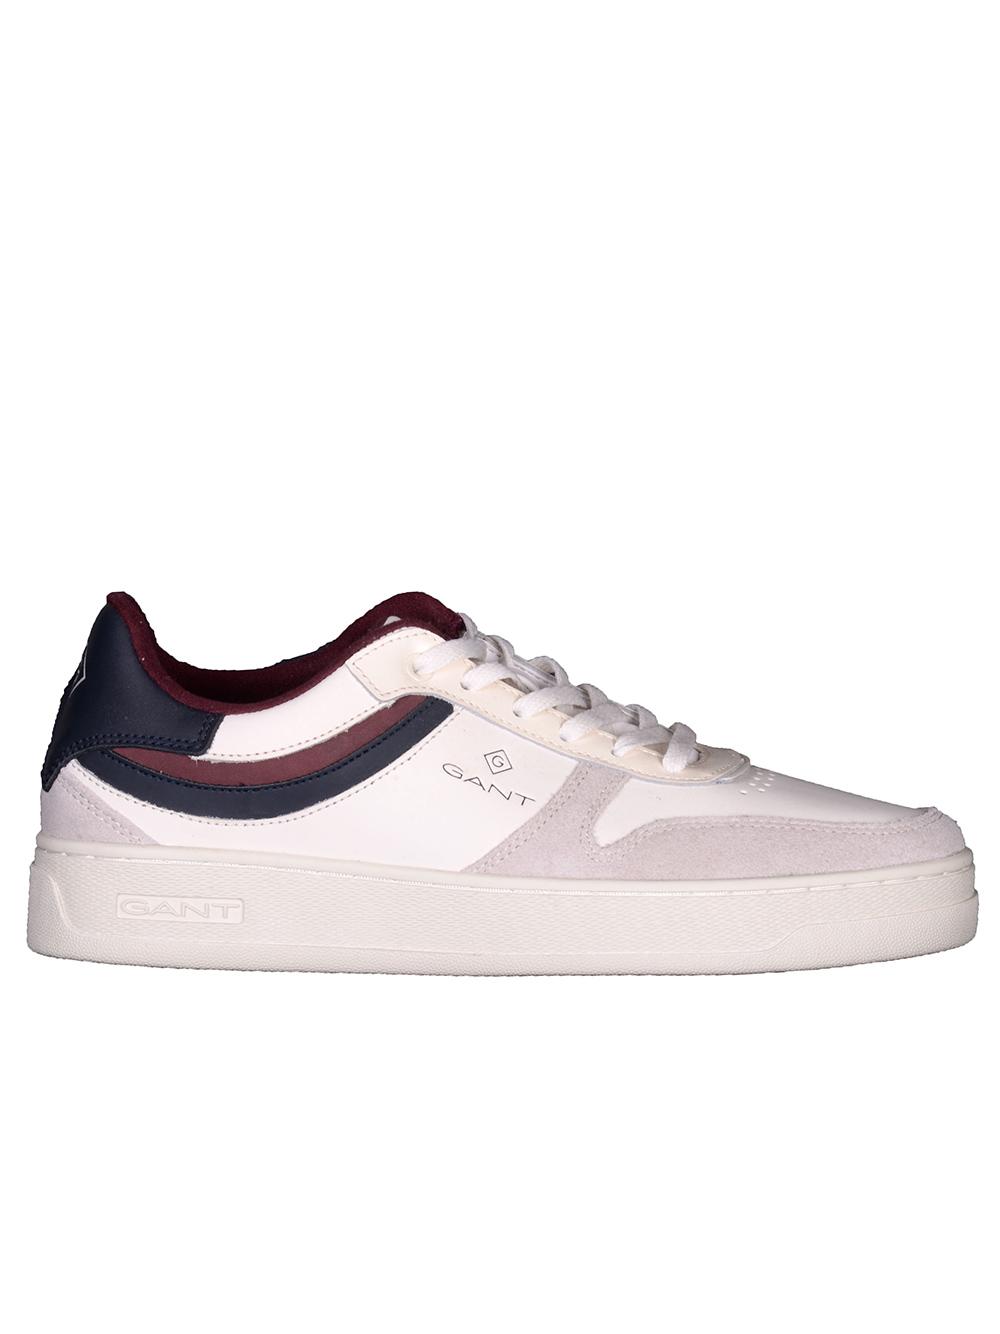 GANT Παπούτσια δετά 3GS19631885-20 ΛΕΥΚΟ